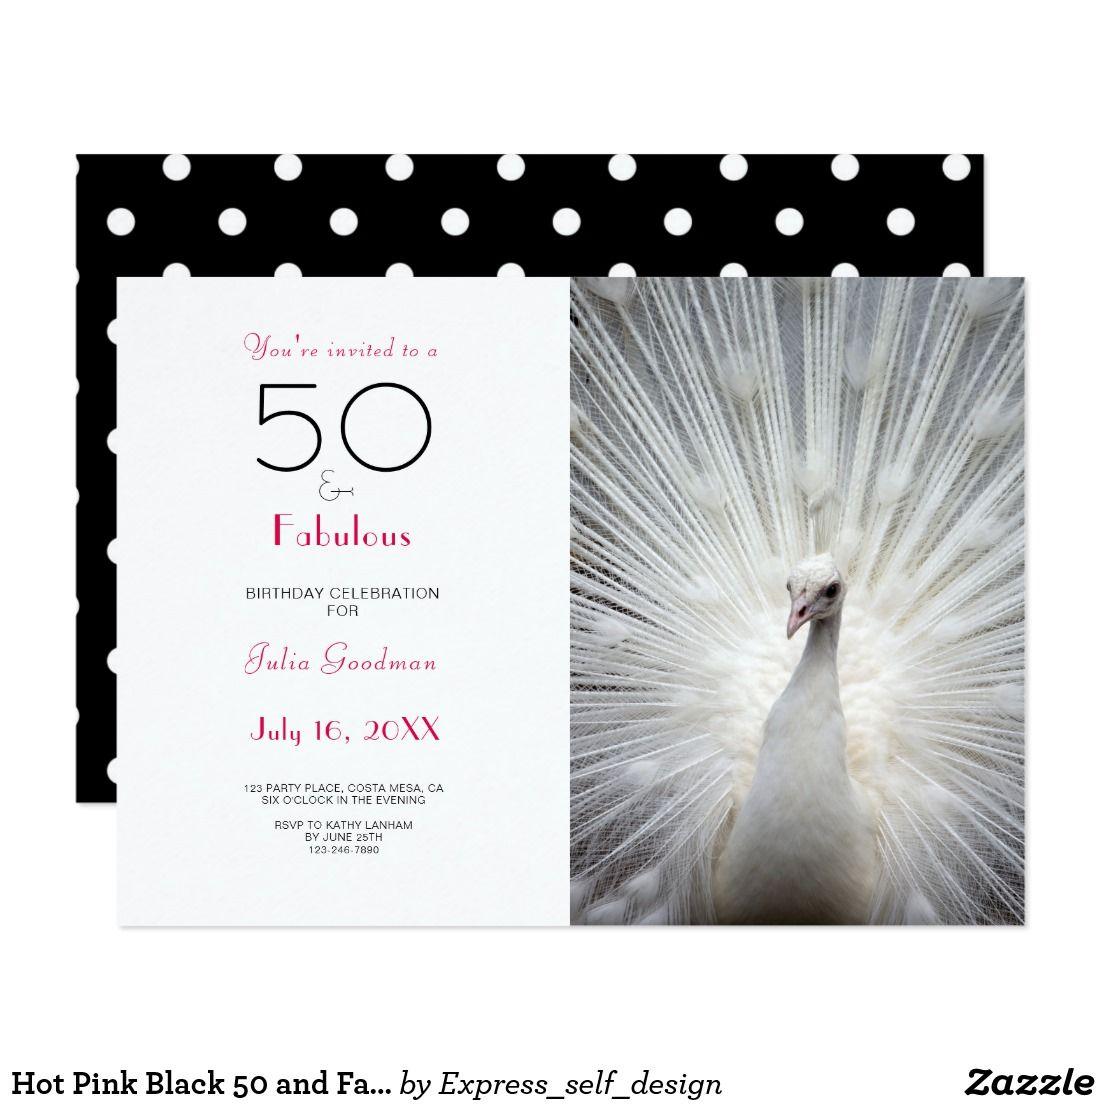 Hot Pink Black 50 and Fabulous Birthday Invitation | 50th Birthday ...